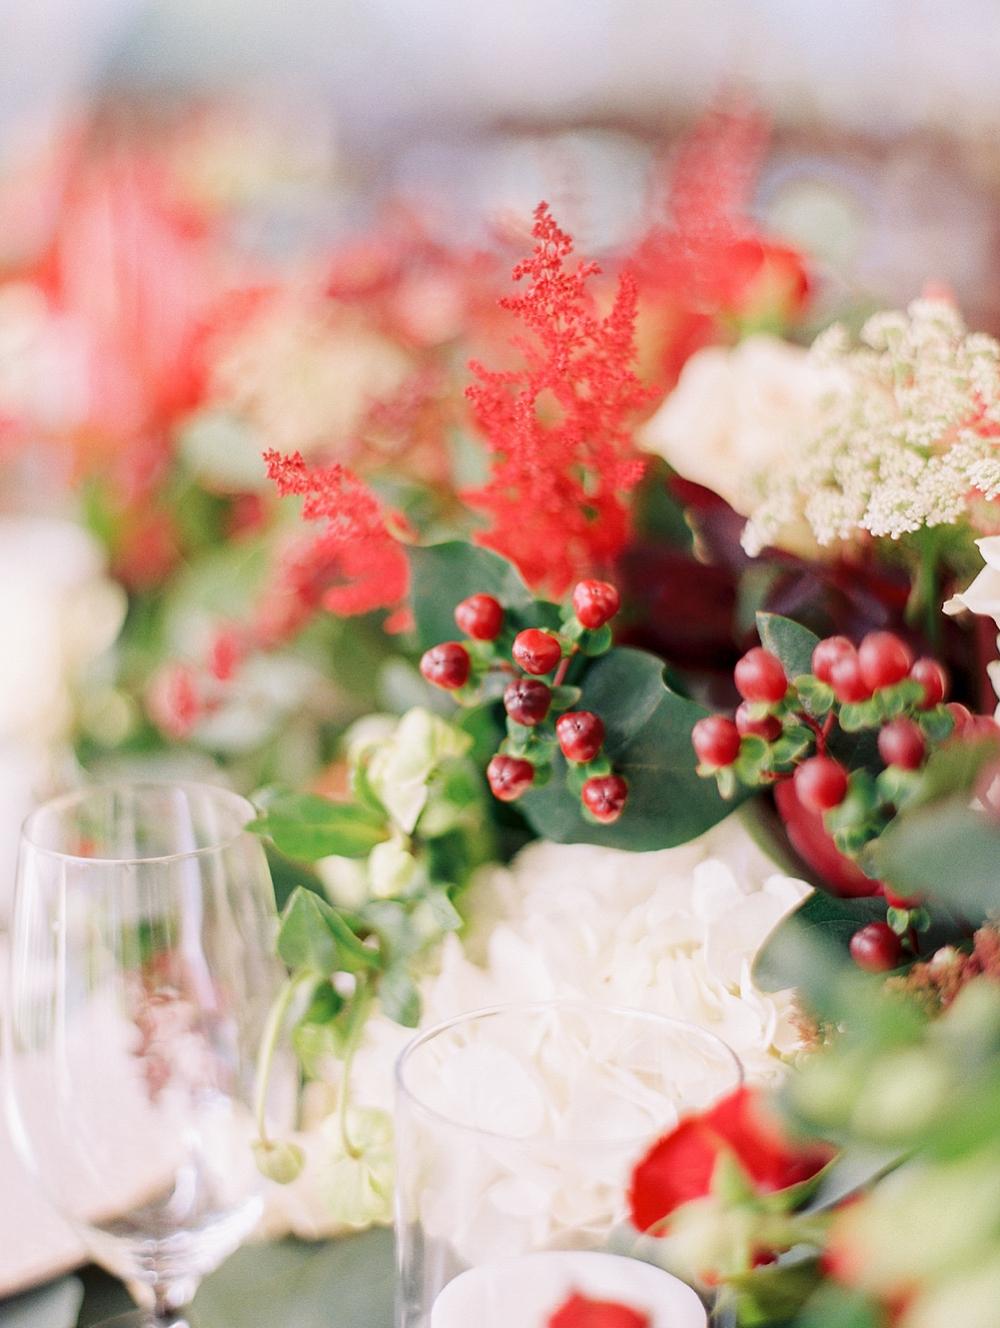 kristin-la-voie-photography-AUSTIN-WEDDING-PHOTOGRAPHER-BEST-IN-TEXAS-133